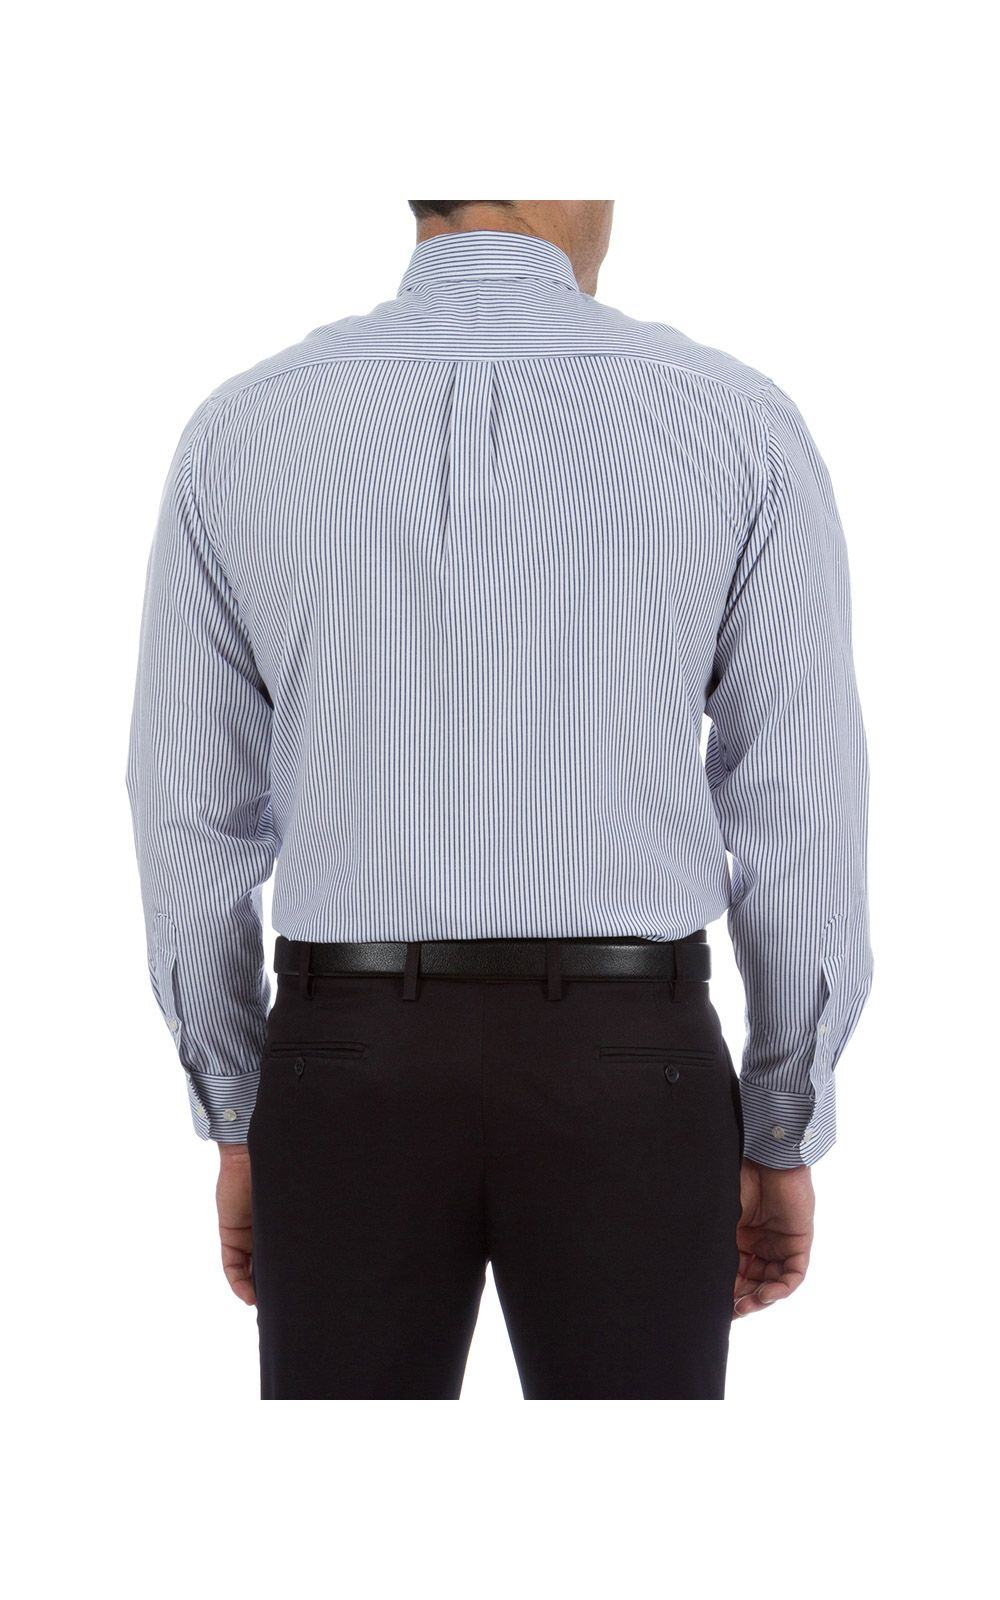 Foto 6 - Camisa Social Masculina Azul Listrada